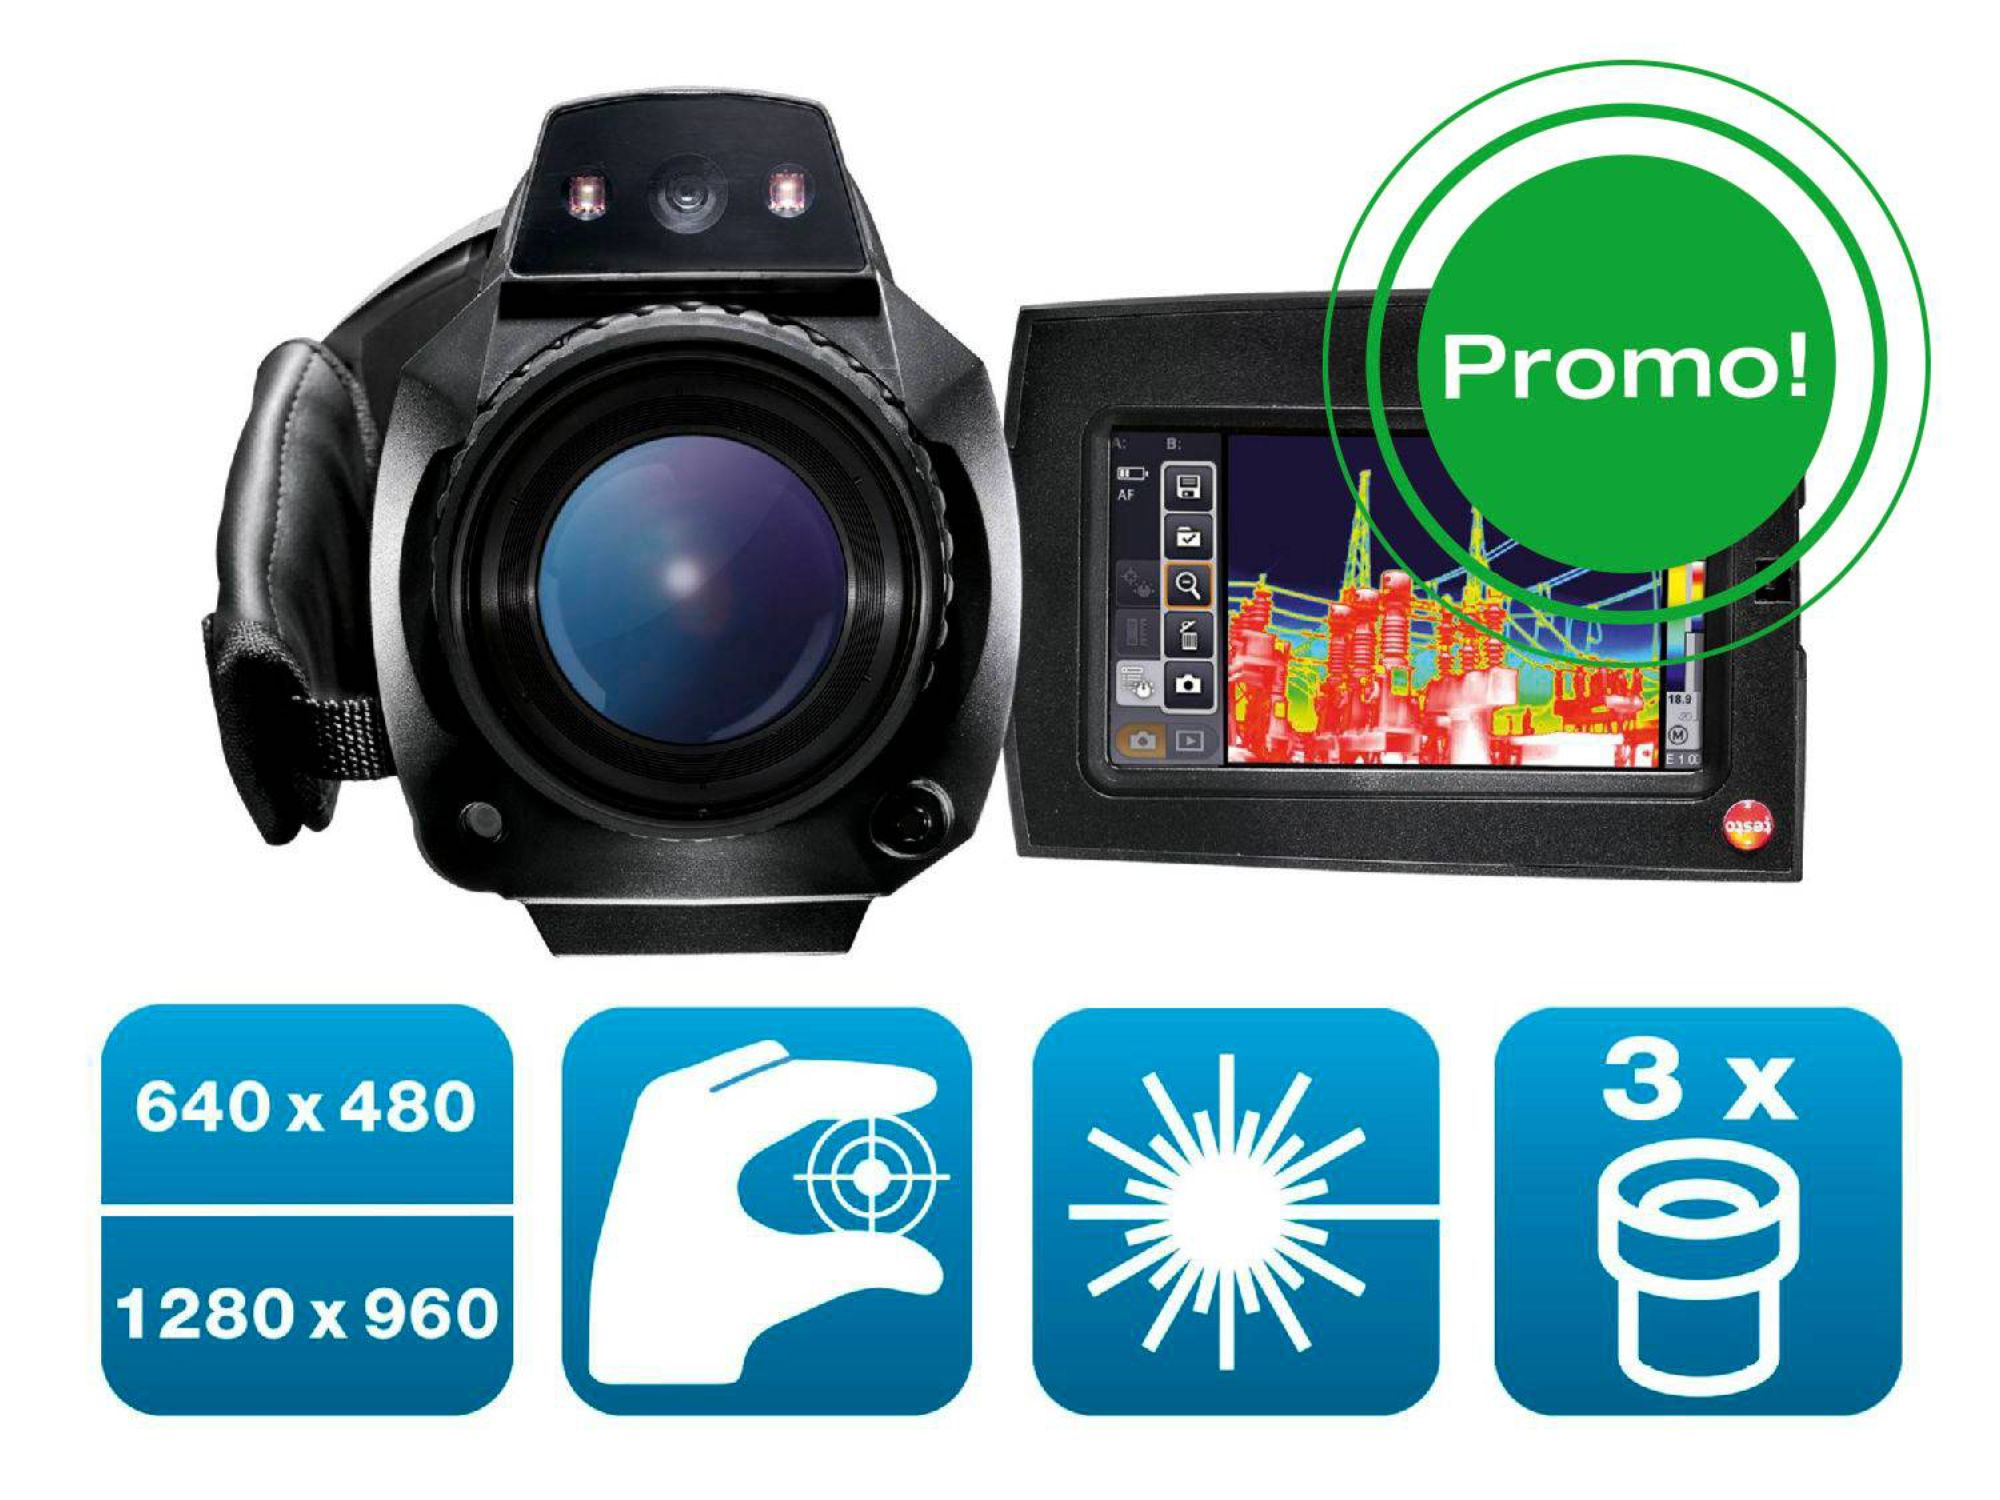 HQ-i-ia-lg-TIweb-2020-Start-890-X6-supertele-3lens-2000x1500-EN.jpg